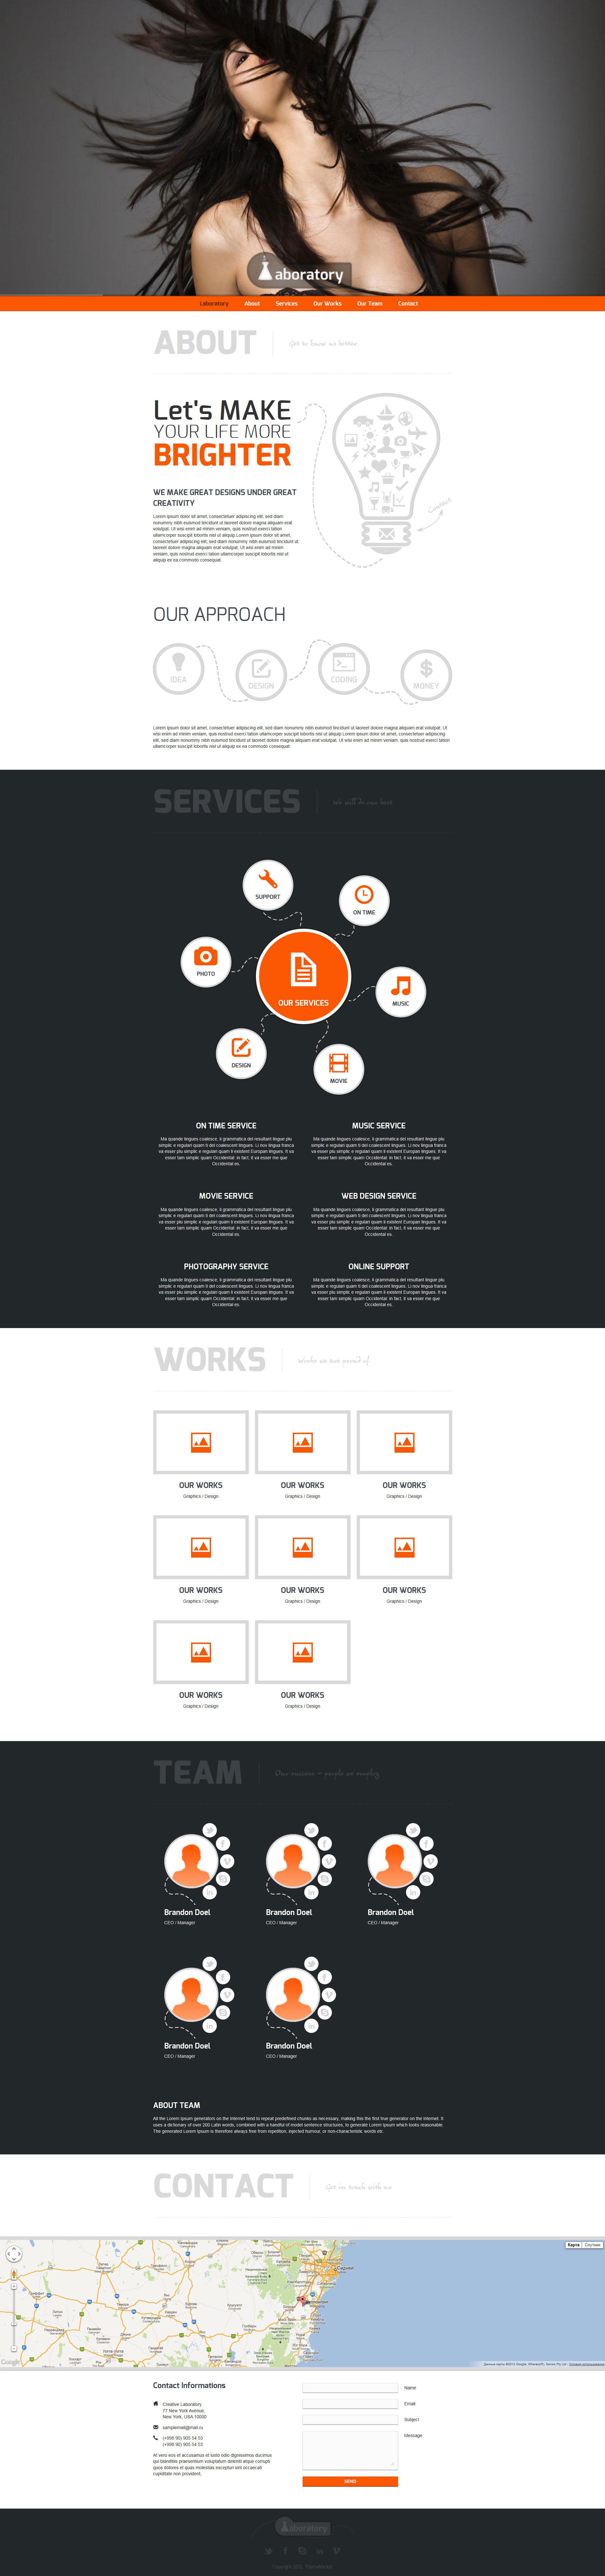 Laboratory - Onepage HTML5 Template by ThemeMarket | ThemeForest